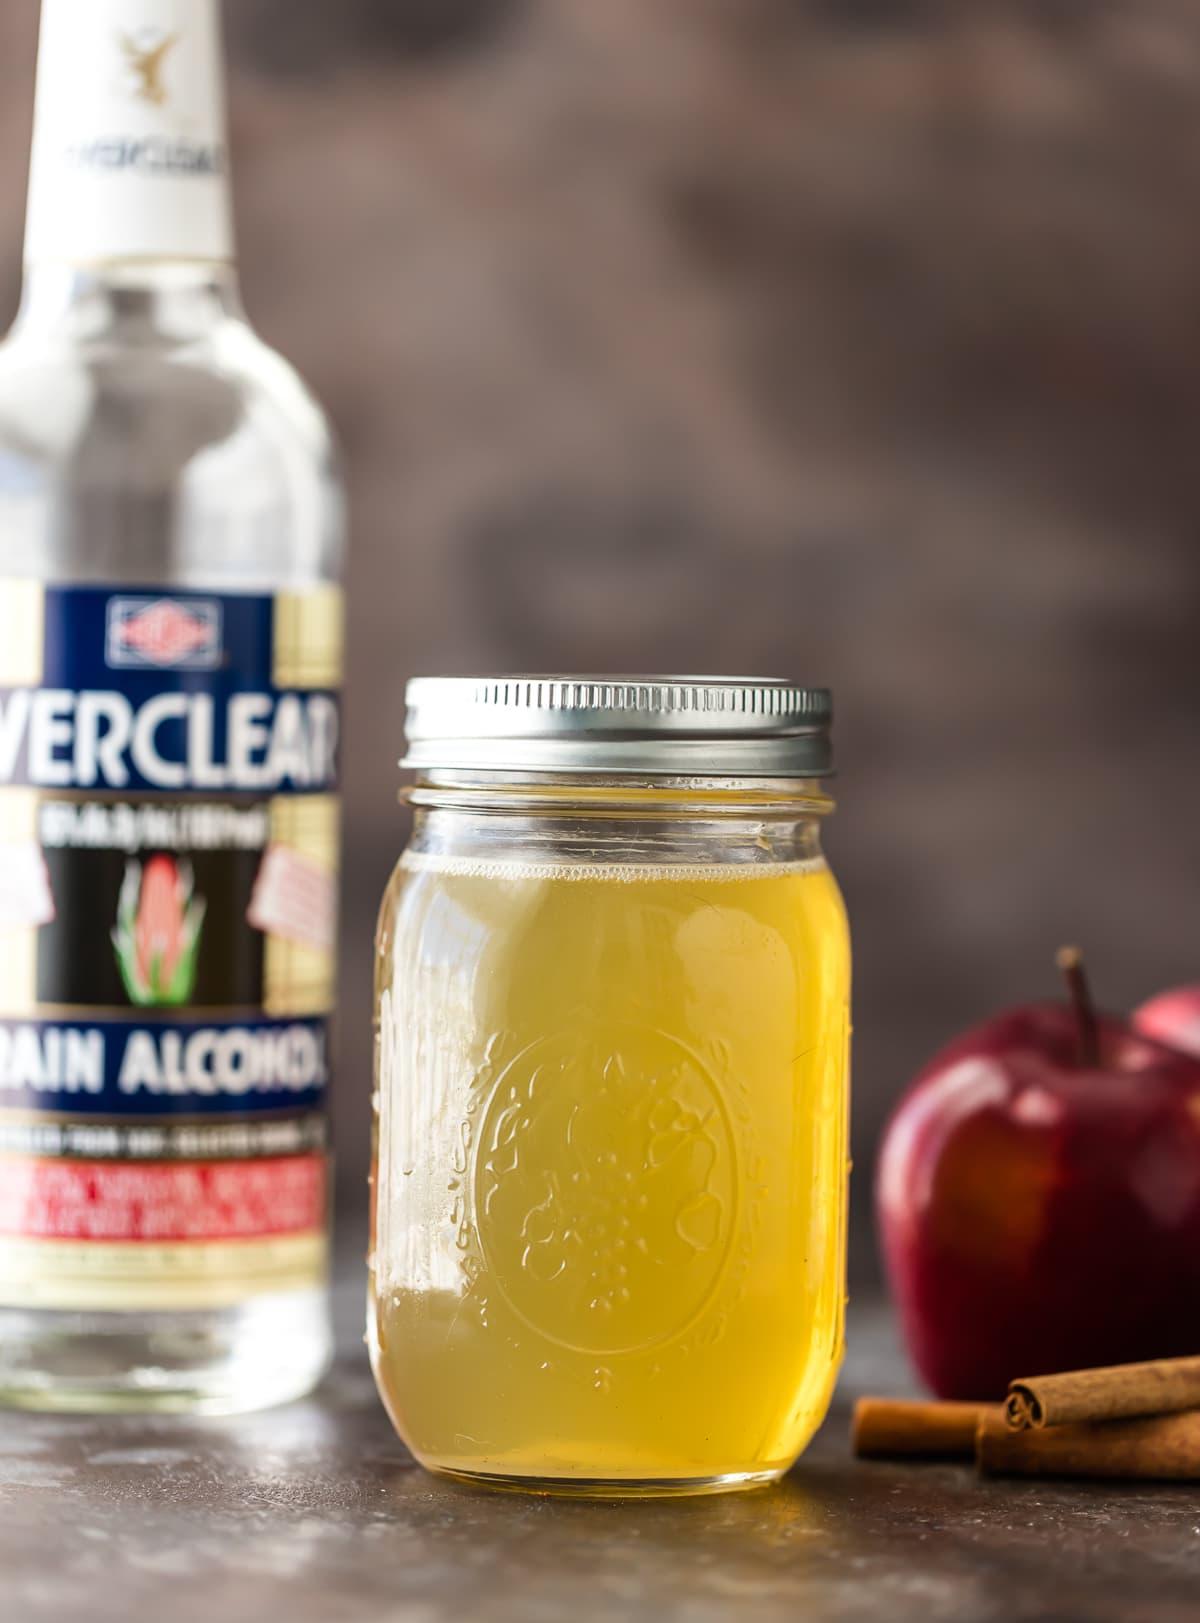 Un frasco de vodka casero de manzana junto a una botella de everclear